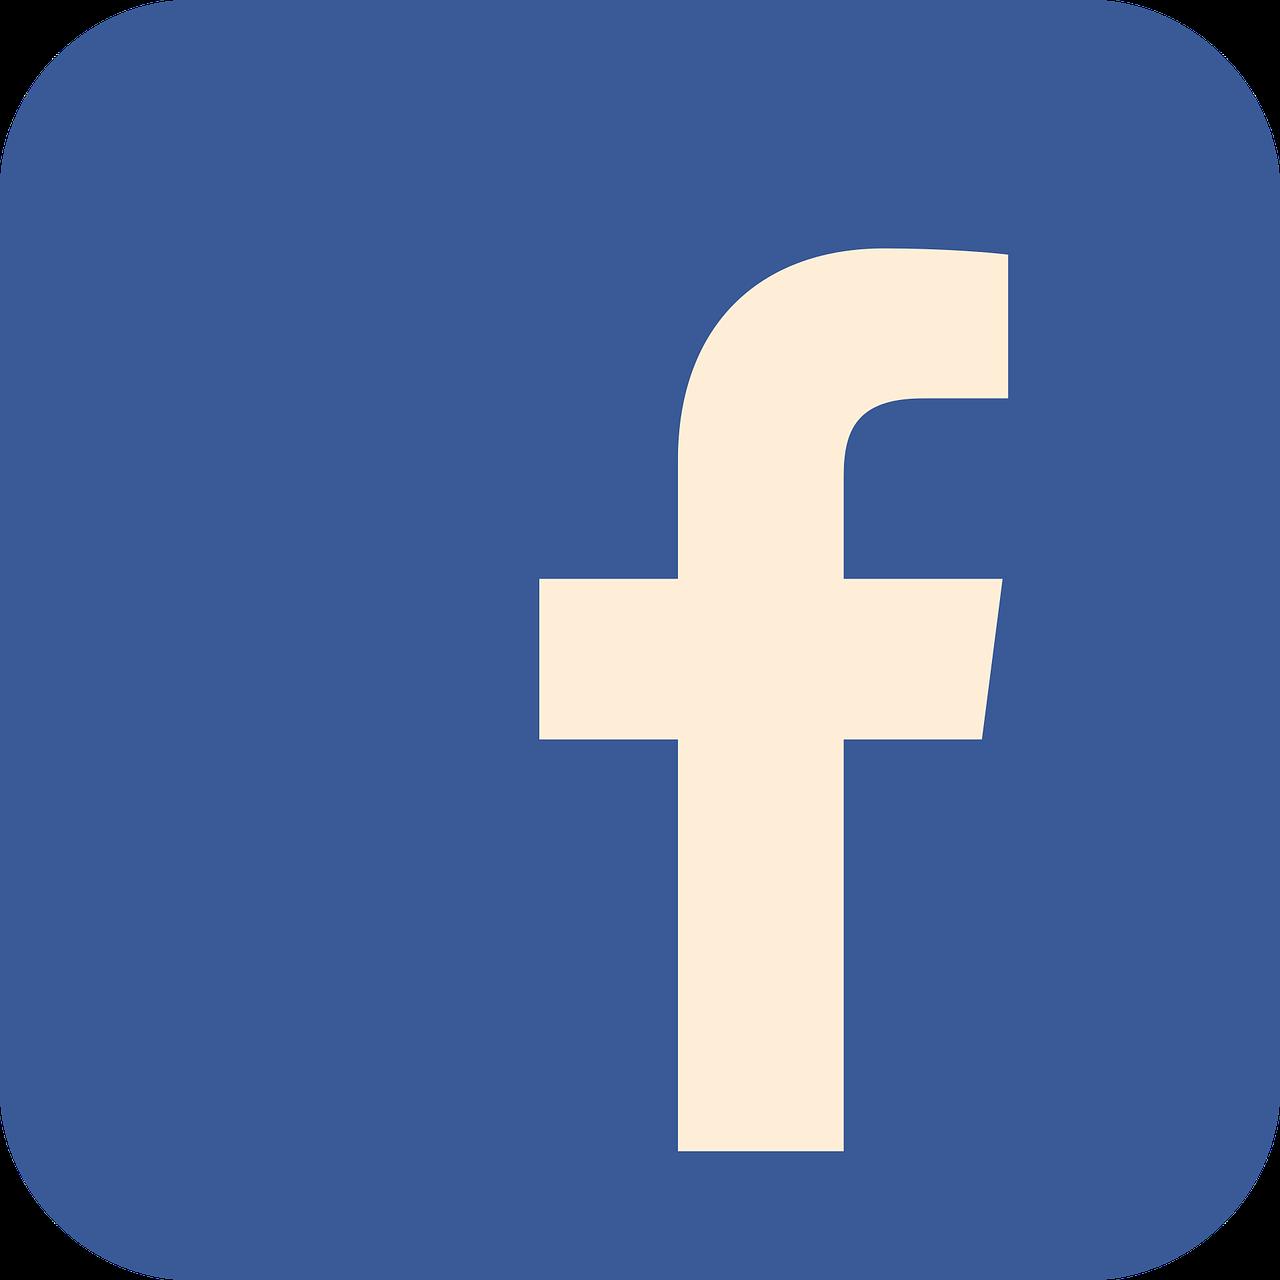 facebook-2429746_1280.png